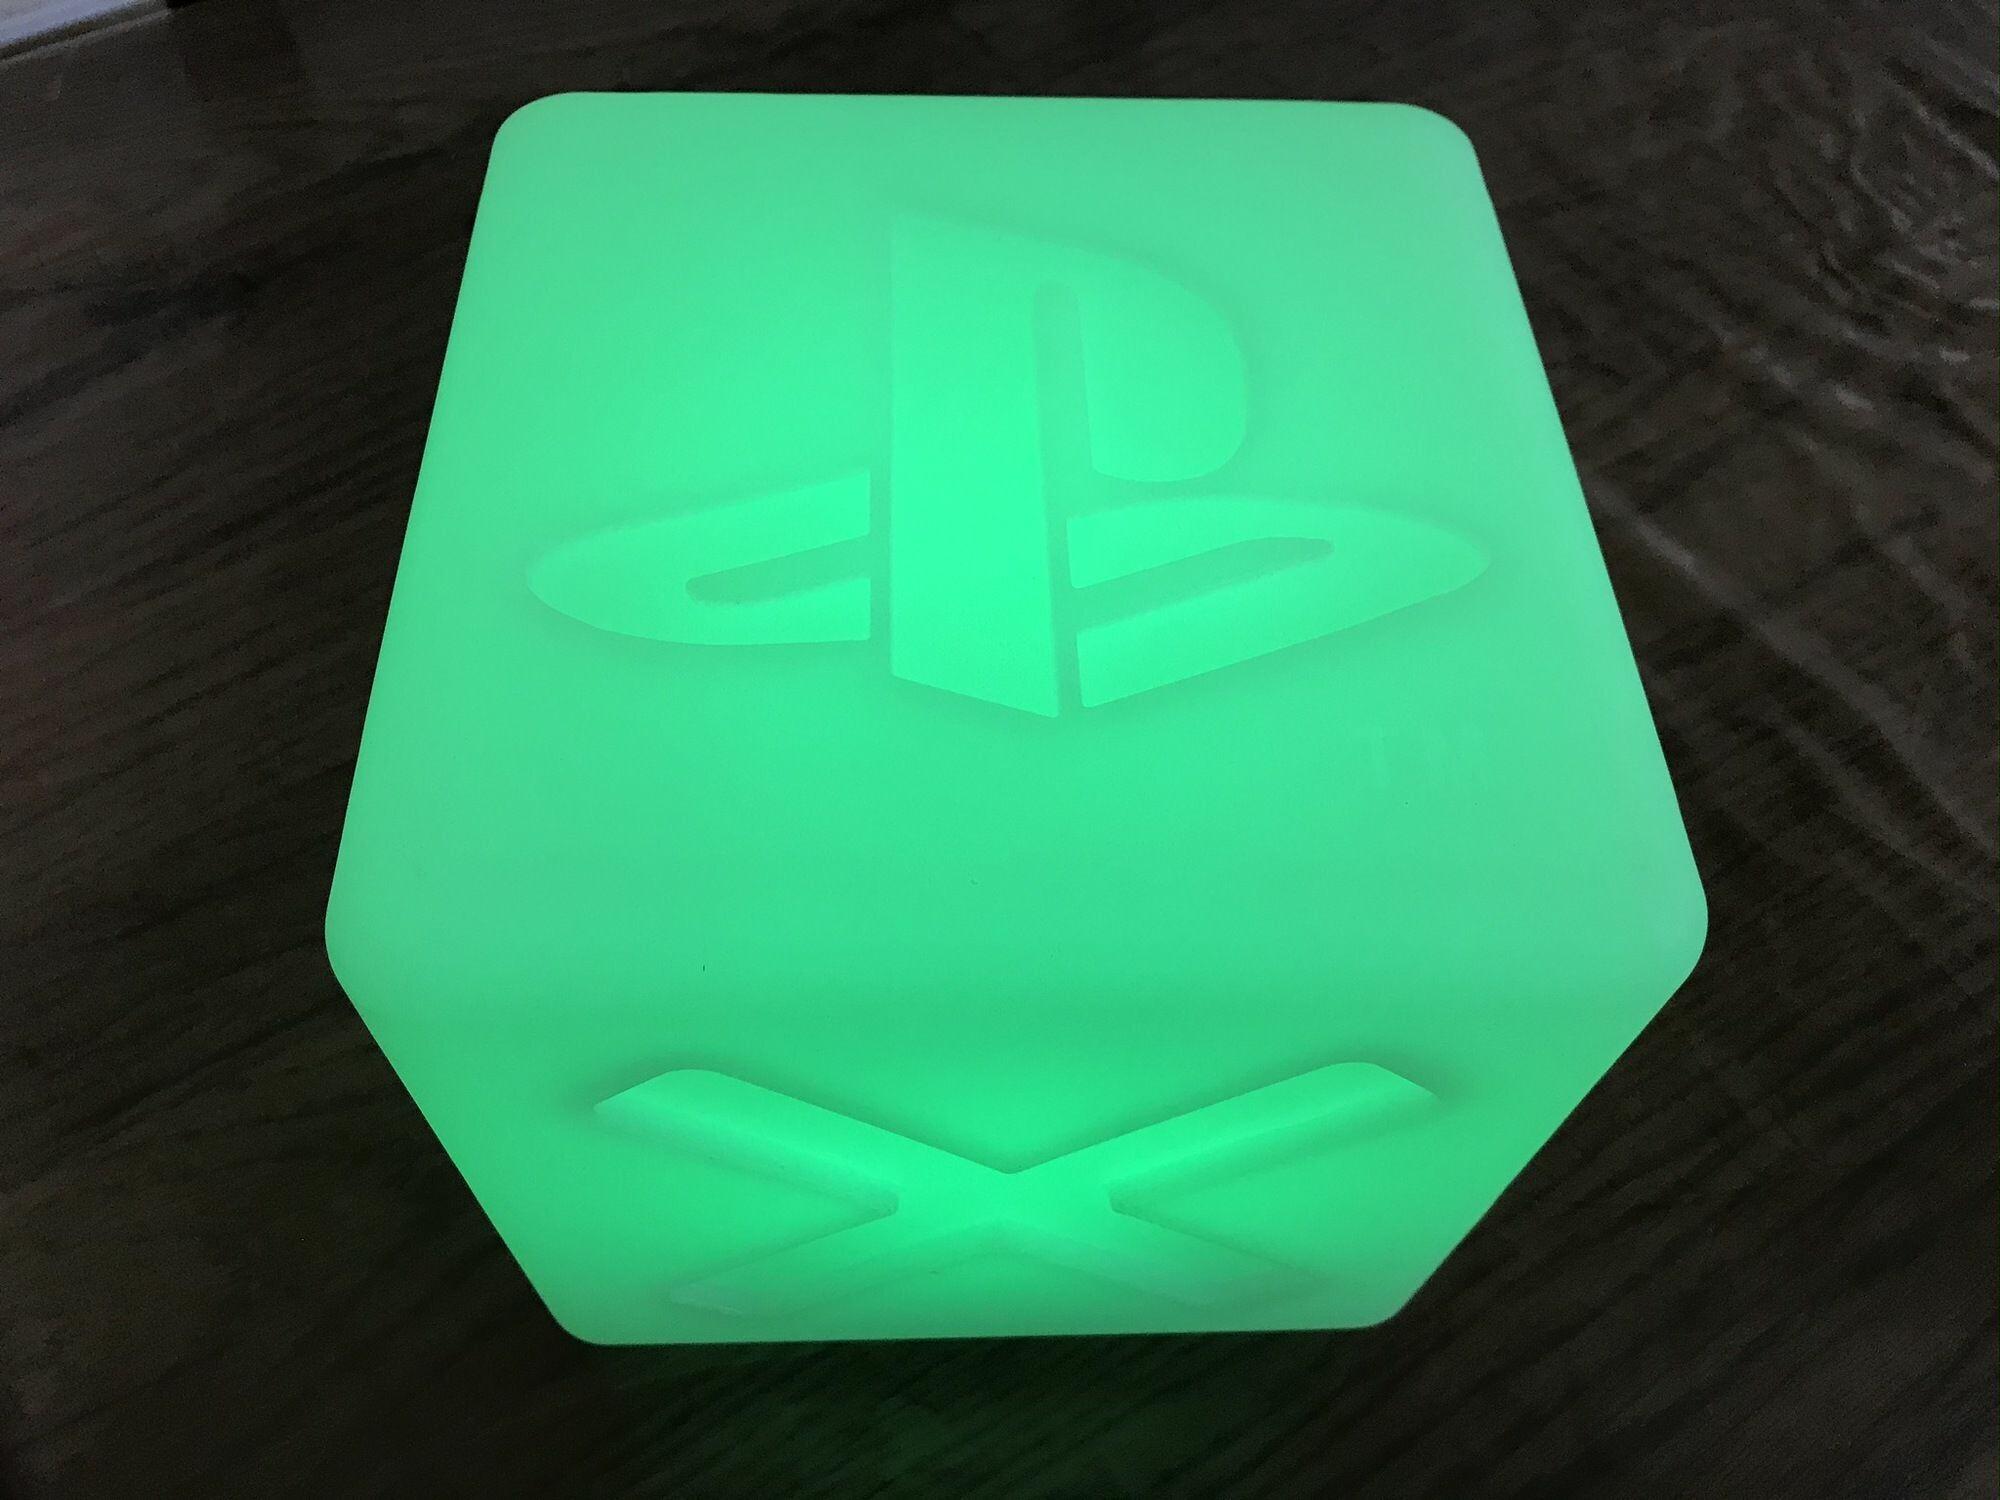 Cube Playstation